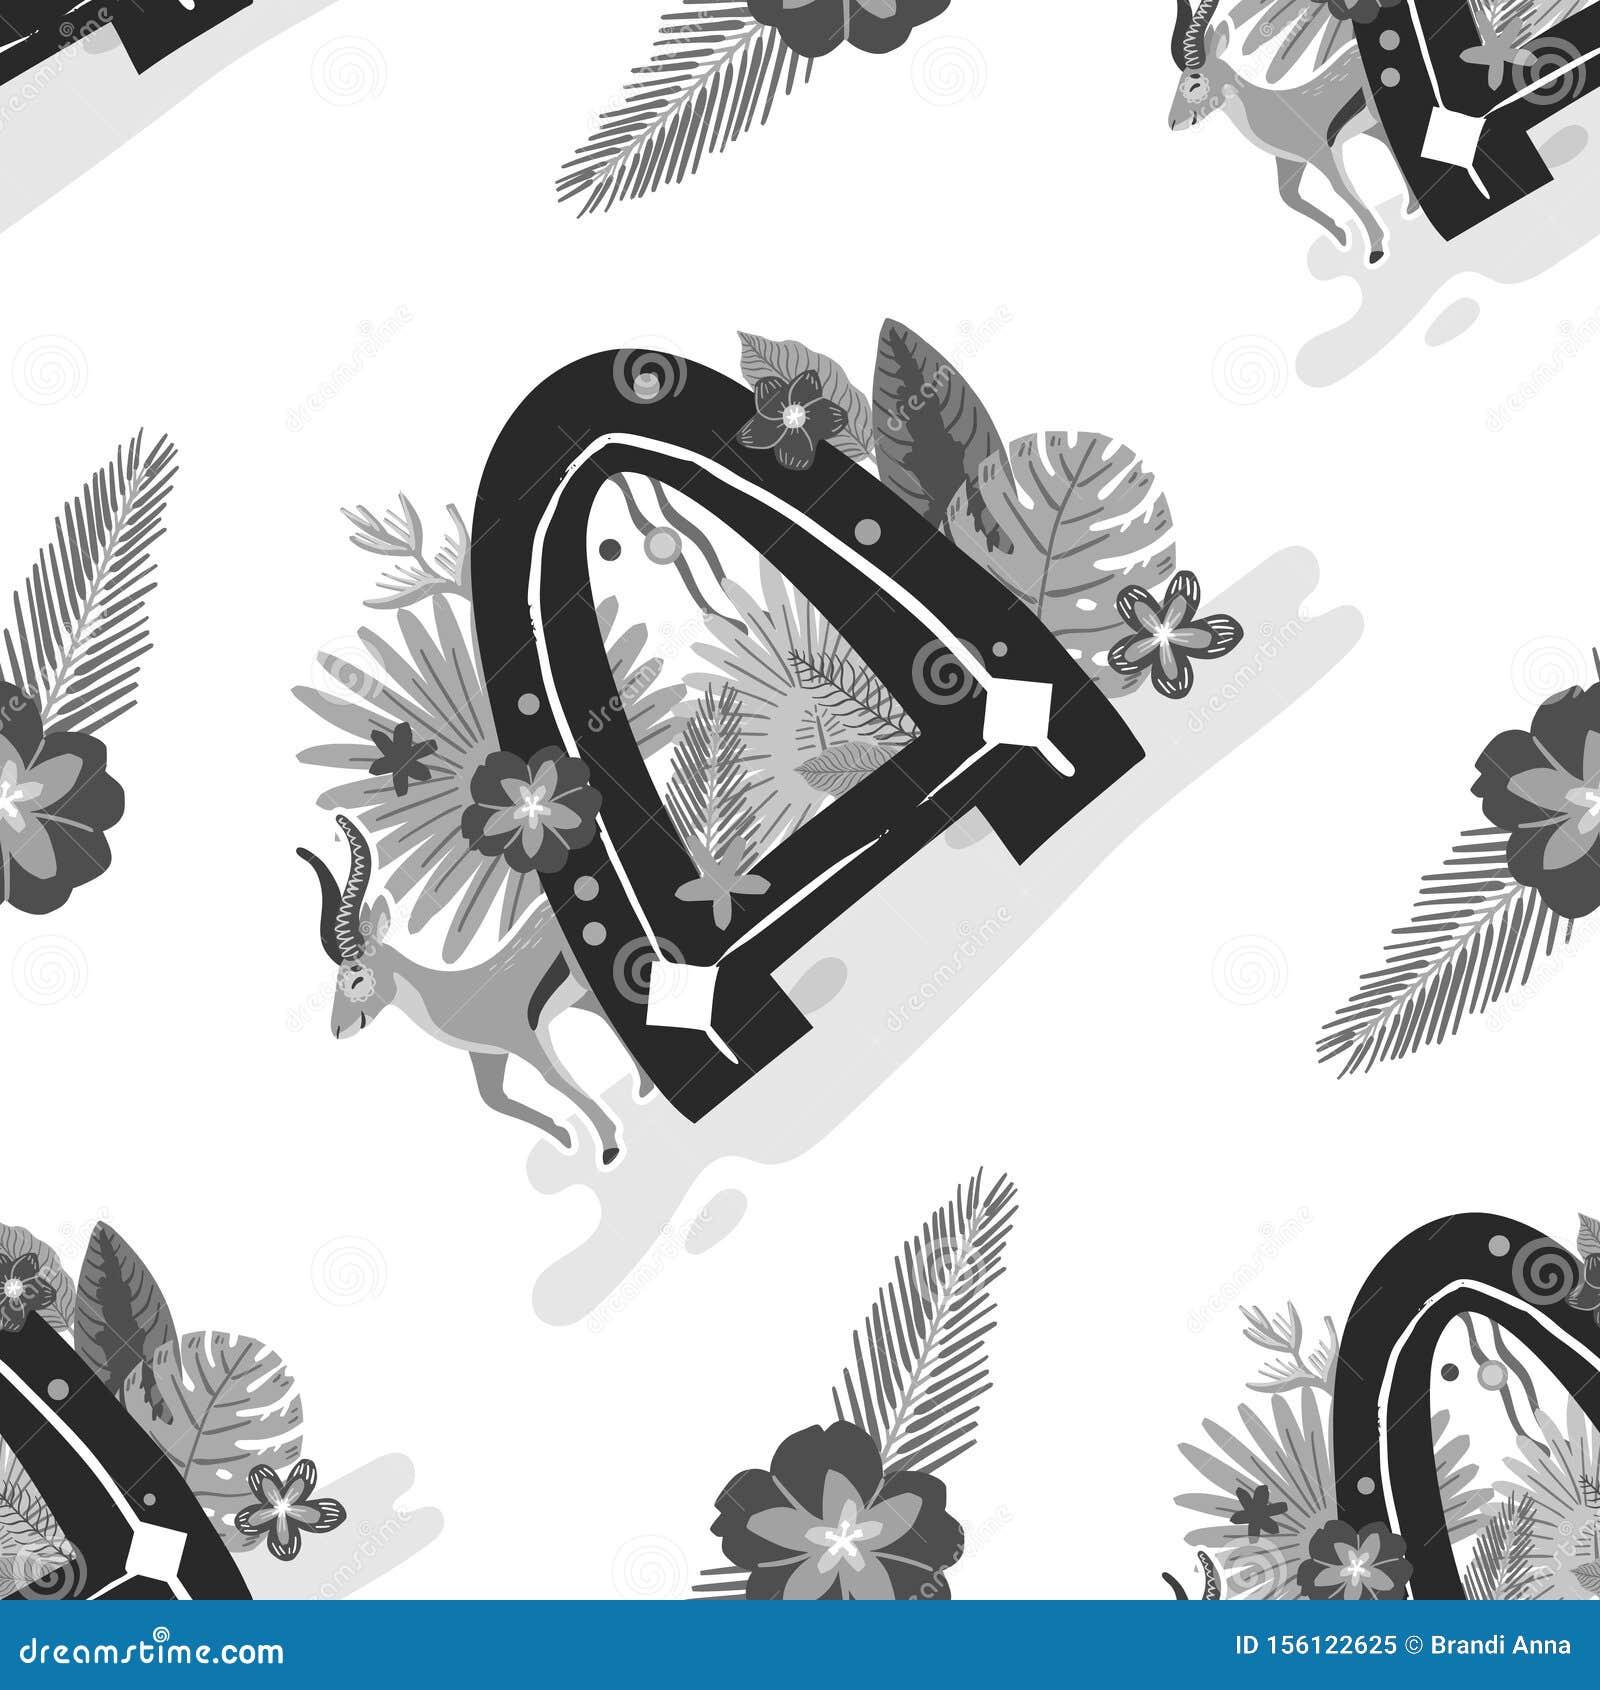 Cute Greyscale Stock Illustrations 286 Cute Greyscale Stock Illustrations Vectors Clipart Dreamstime